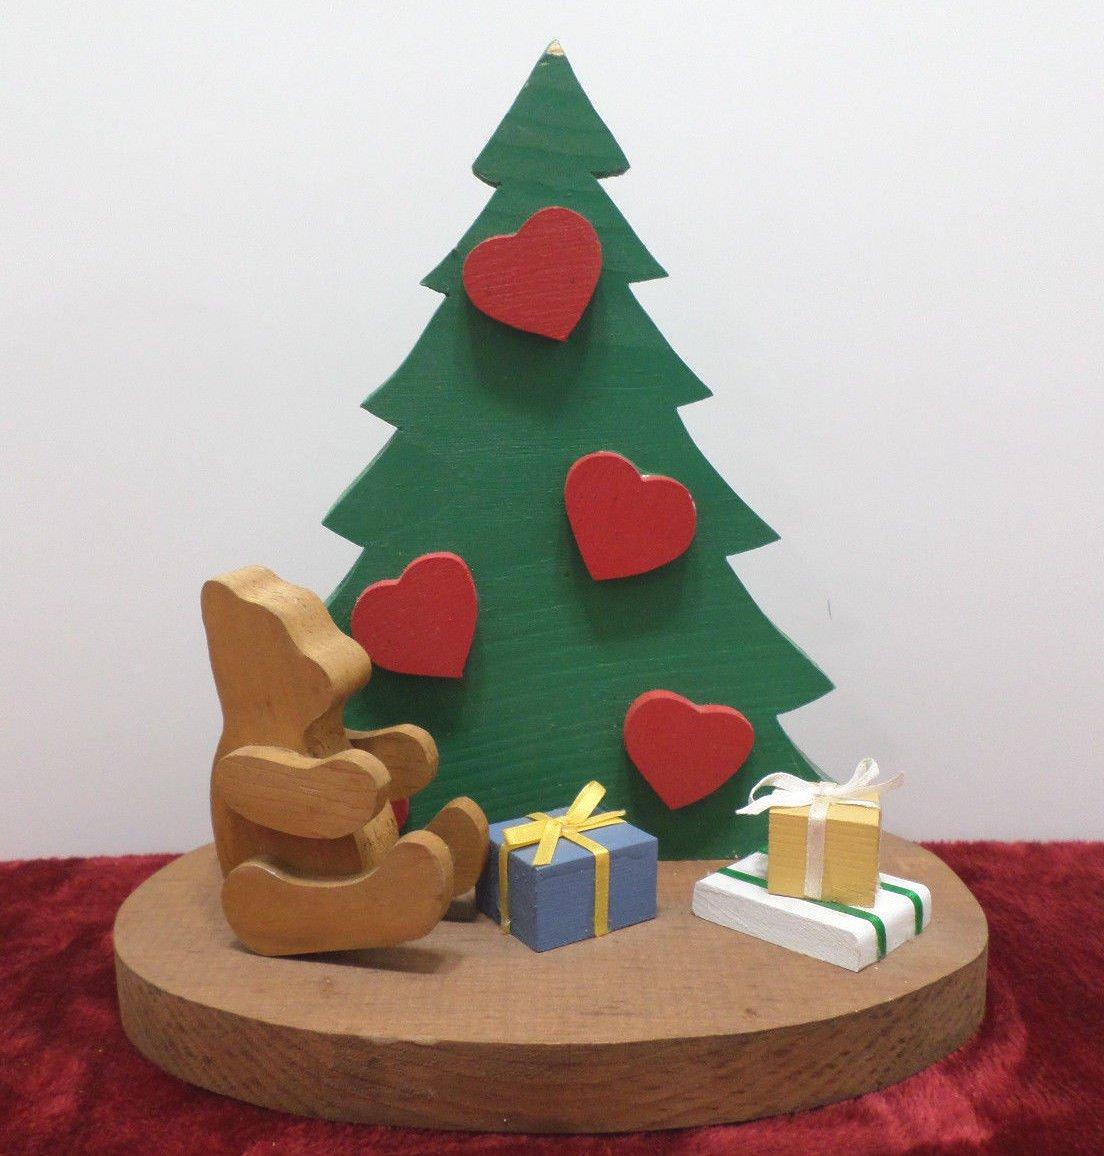 Wooden Christmas Figurine Christmas Tree Teddy Bear Gifts Decoration